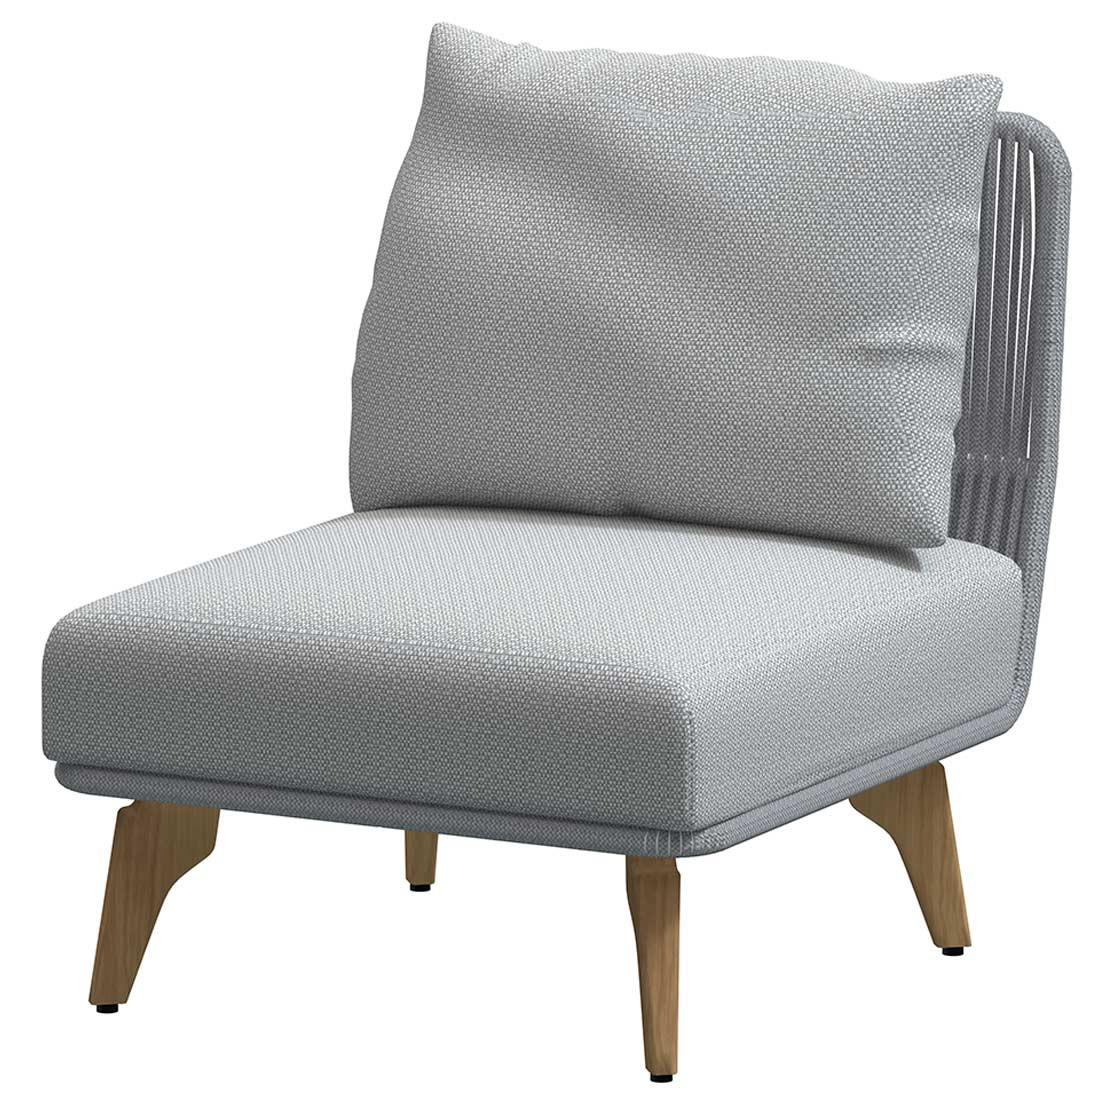 Raphael Modular Teak Frozen center with 2 cushions